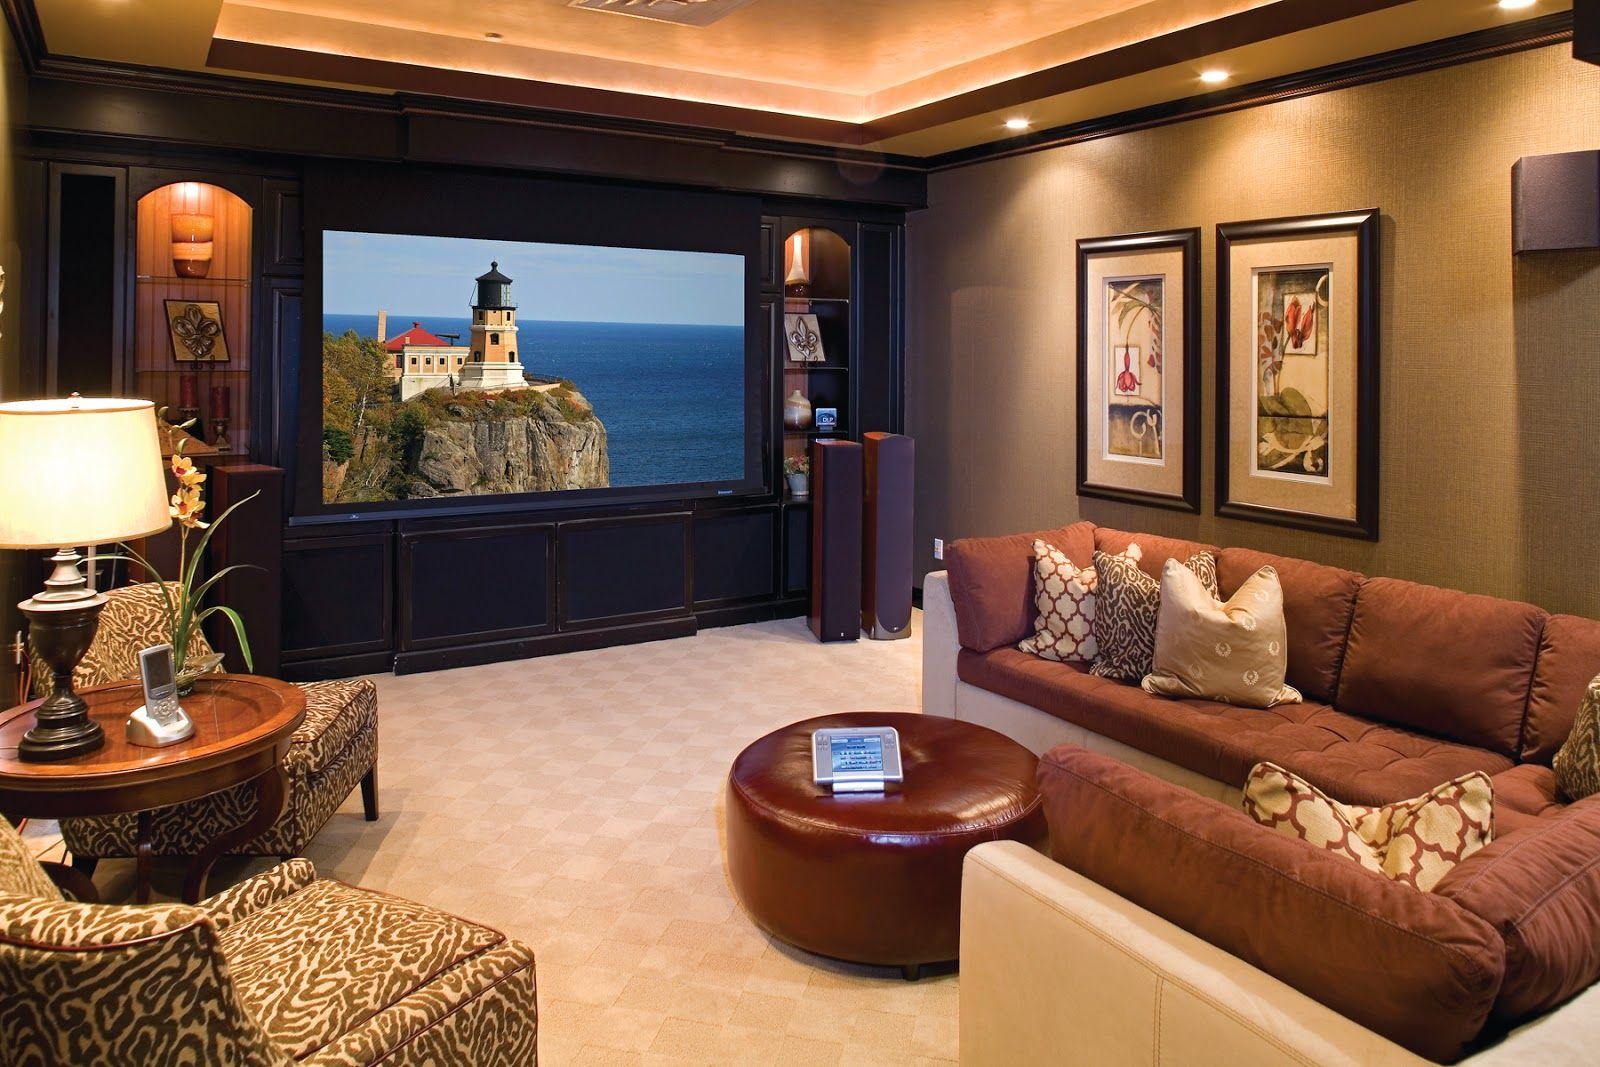 medium resolution of cozy basement living room entertainment center basement remodeling kitchen remodeling remodeling ideas